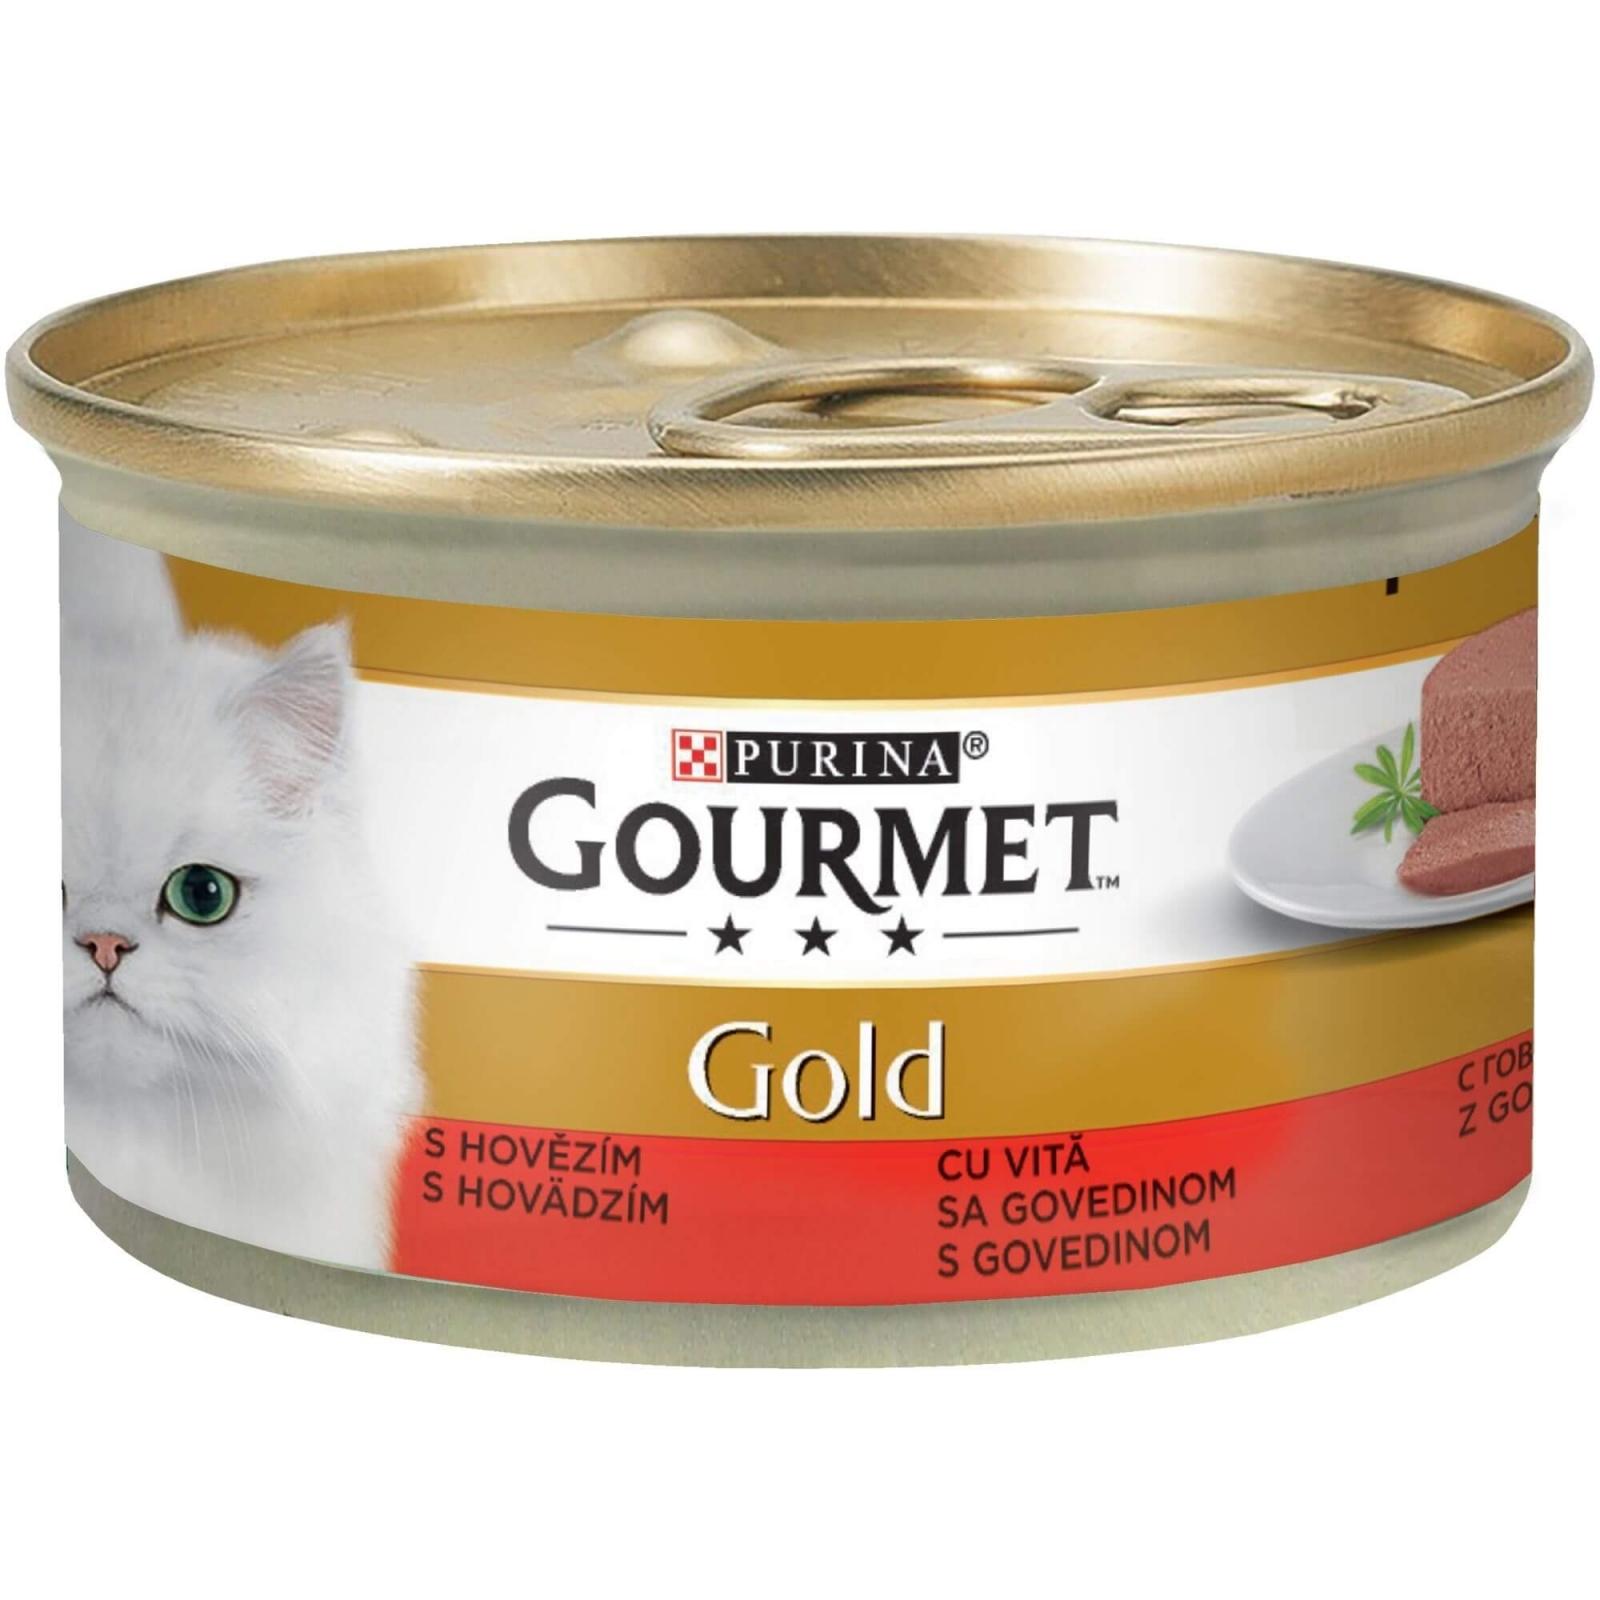 Gourmet Gold Mousse cu Vita, 85 g imagine